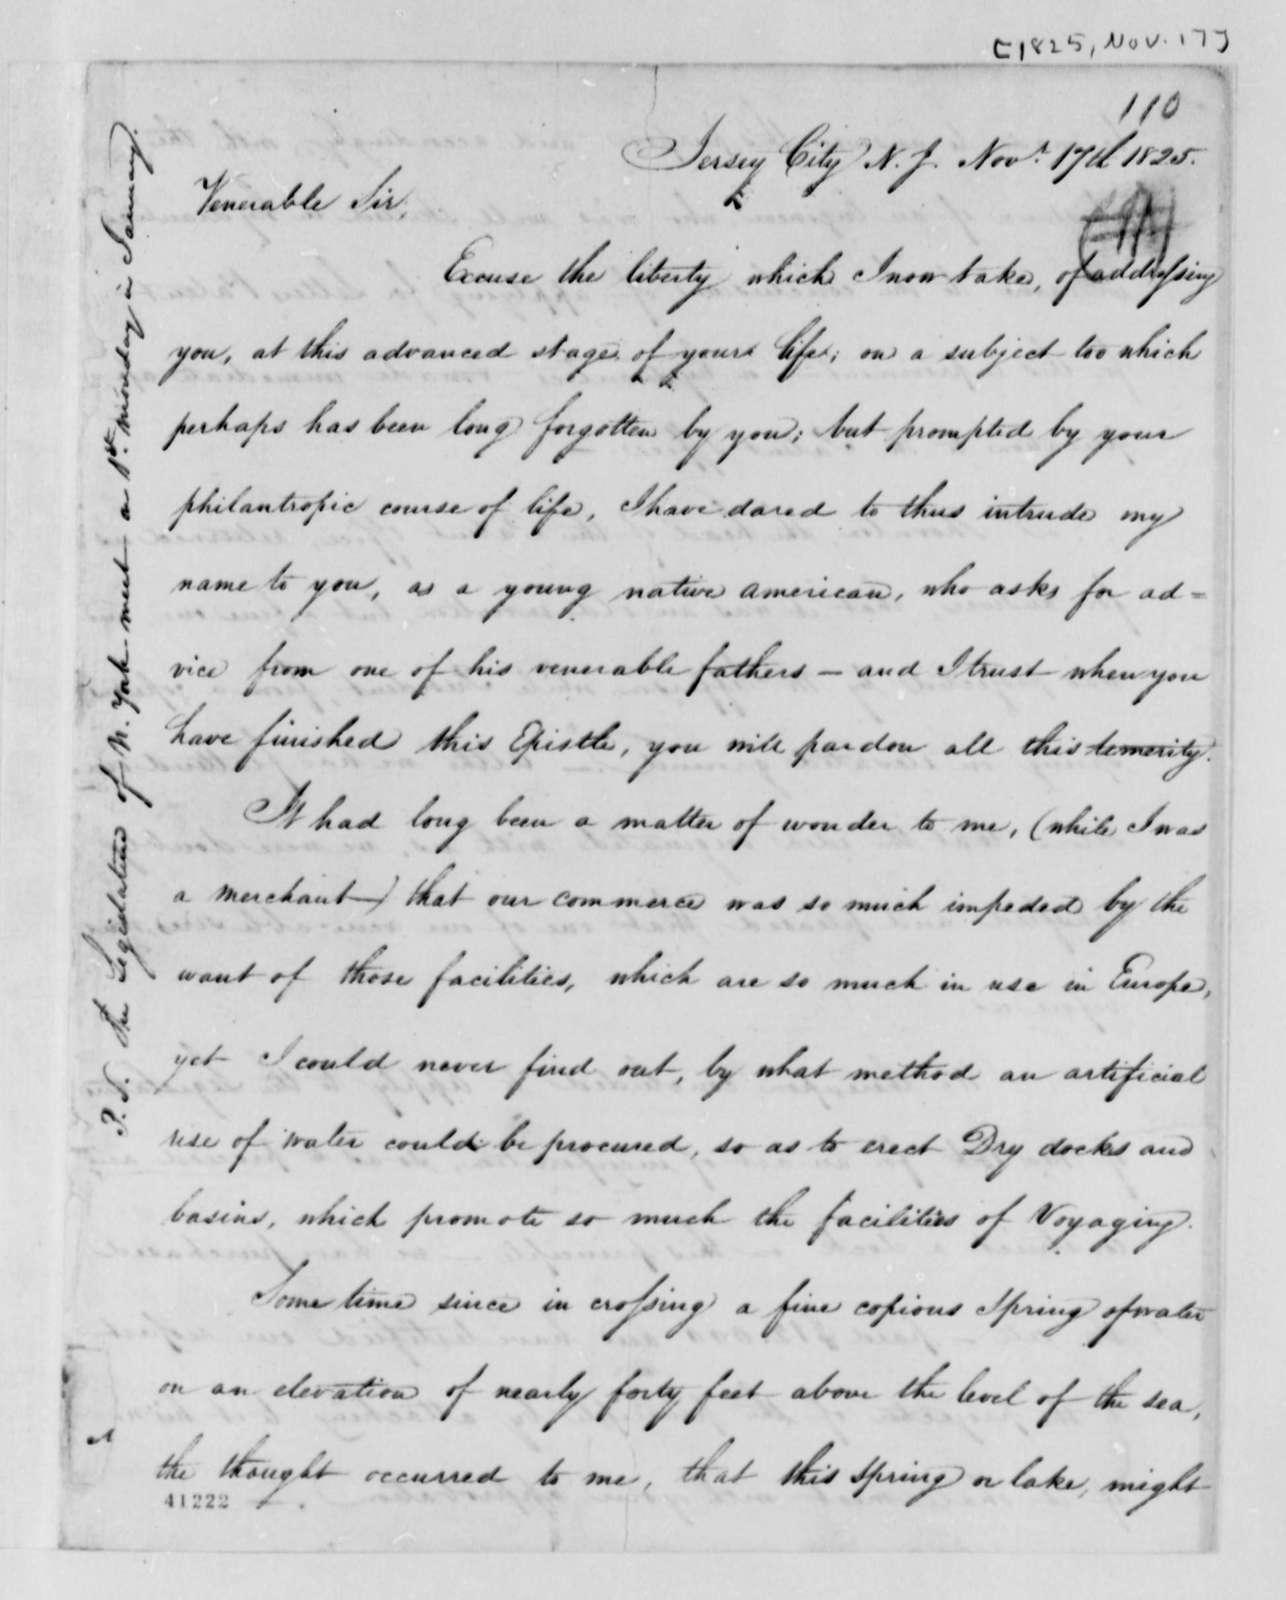 Lewis M. Wiss to Thomas Jefferson, November 17, 1825, with Plans